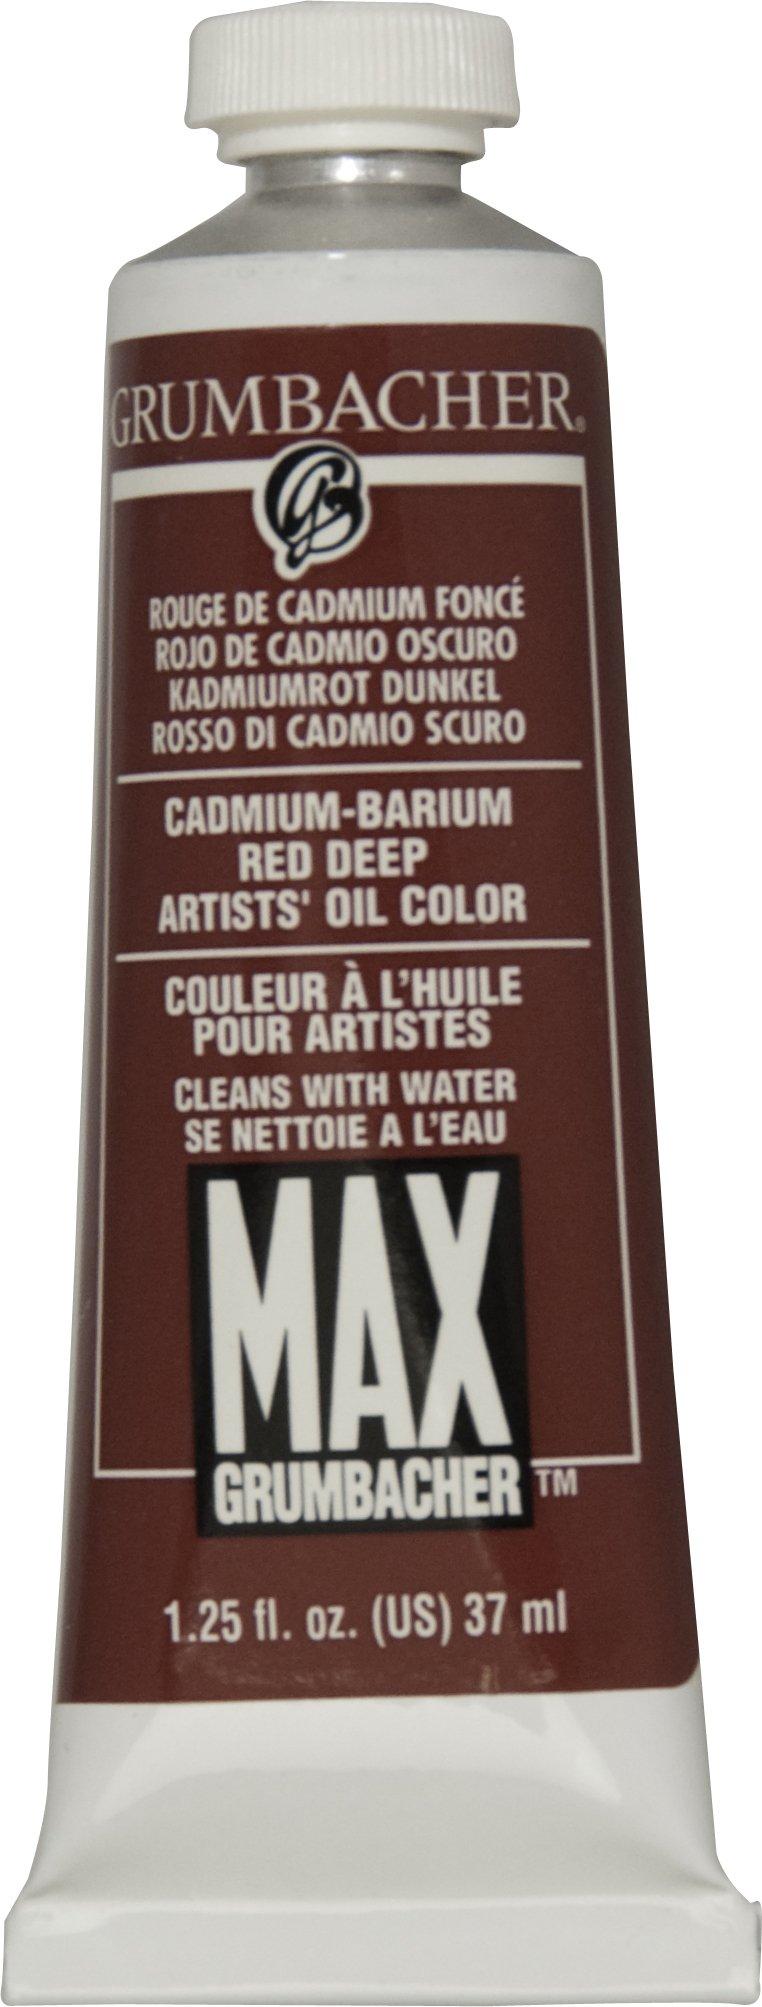 Grumbacher Max Water Miscible Oil Paint, 37ml/1.25 oz, Cadmium-Barium Red Deep